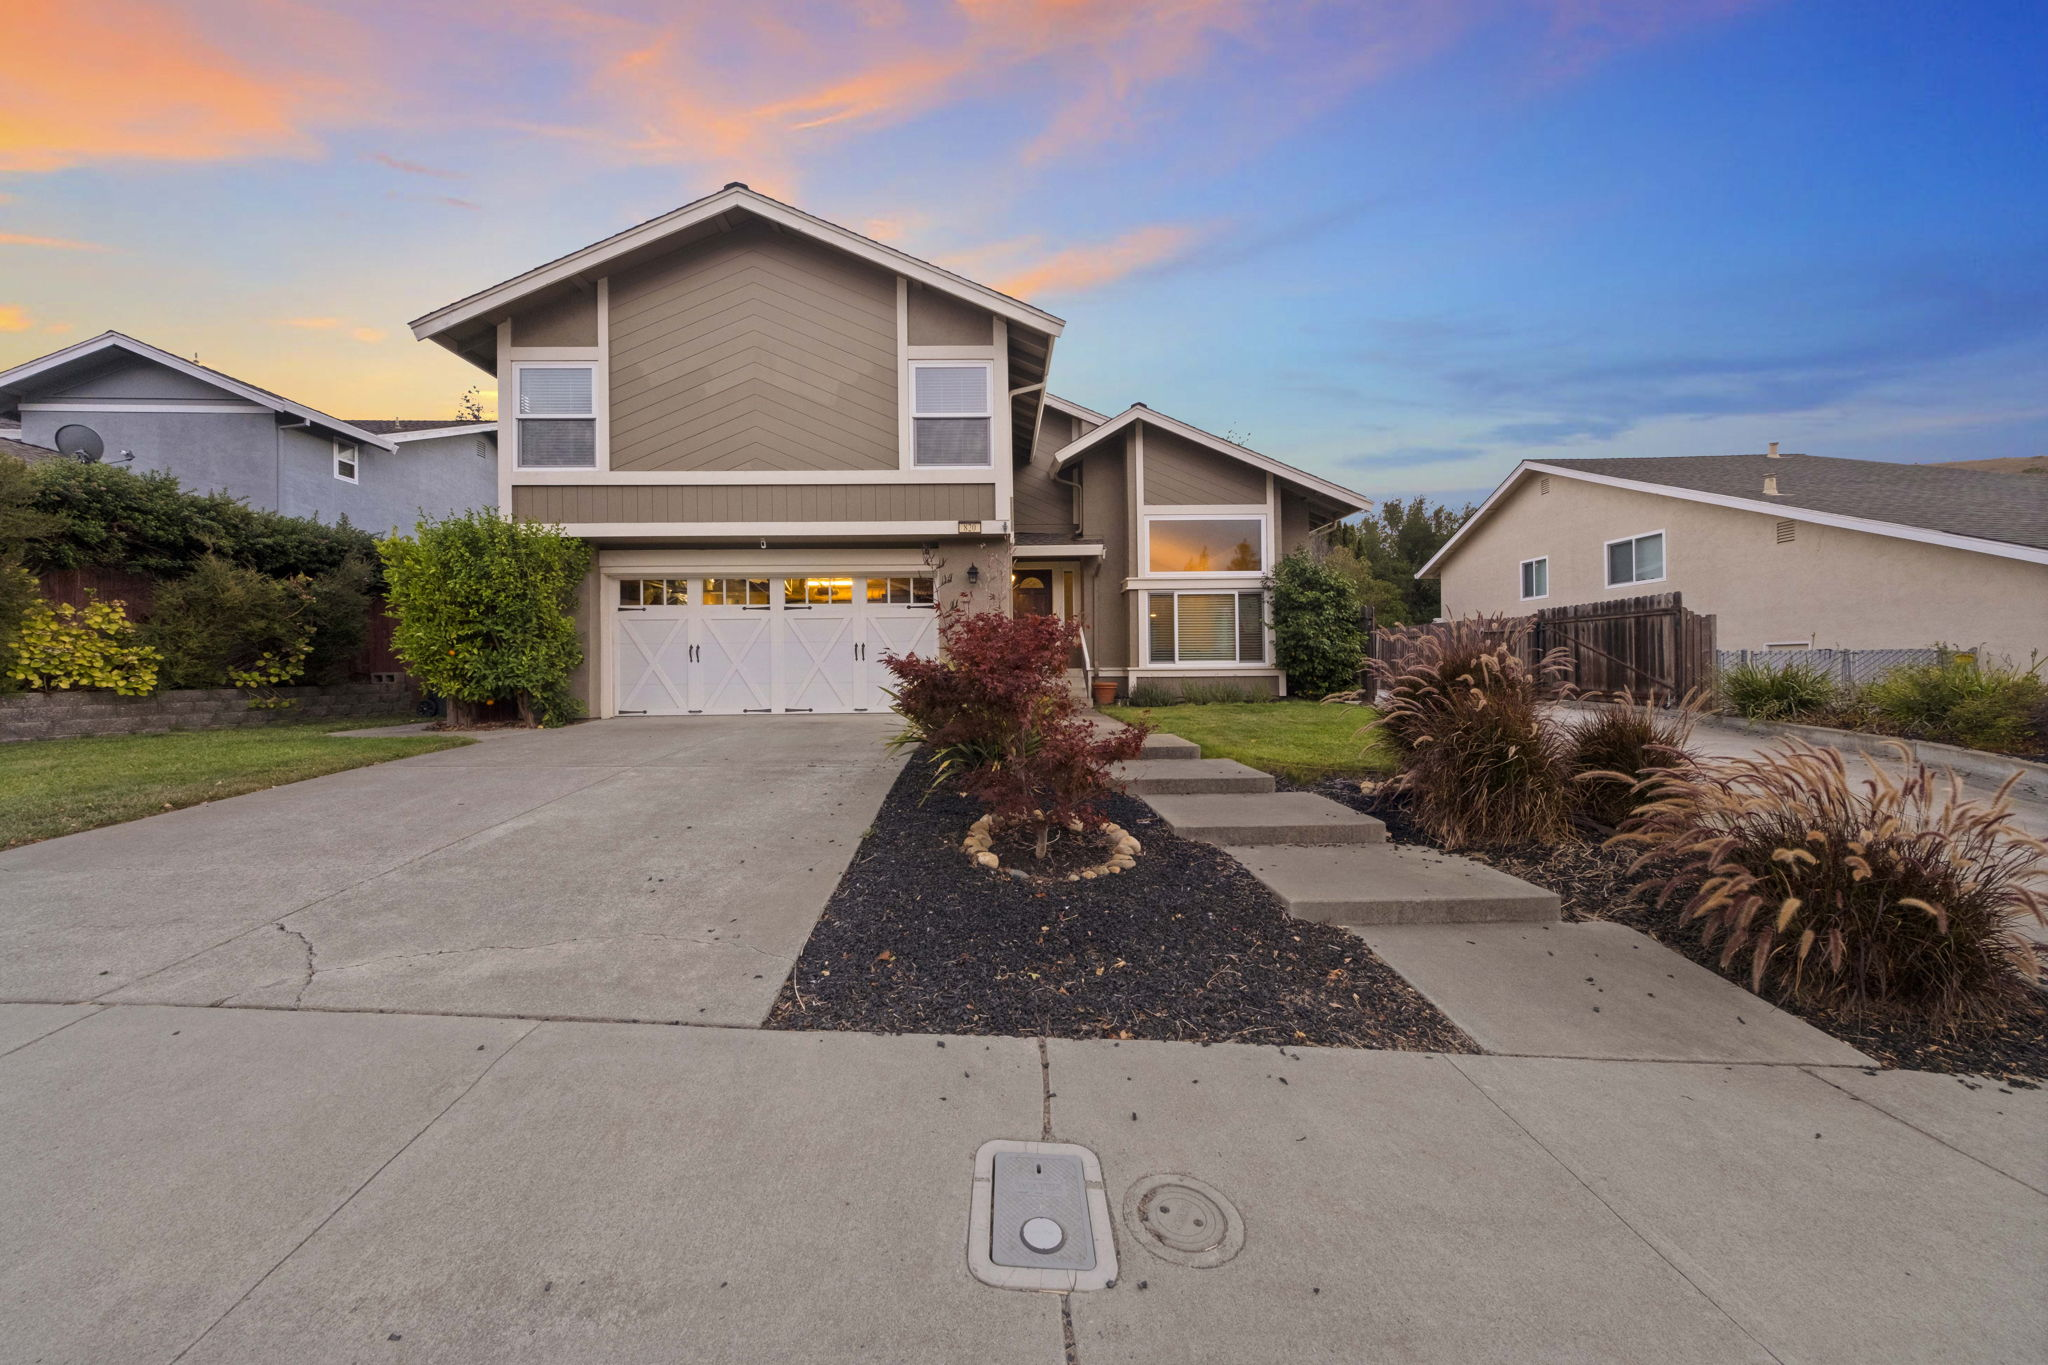 820 Dorset Way, Benicia, CA 94510, USA